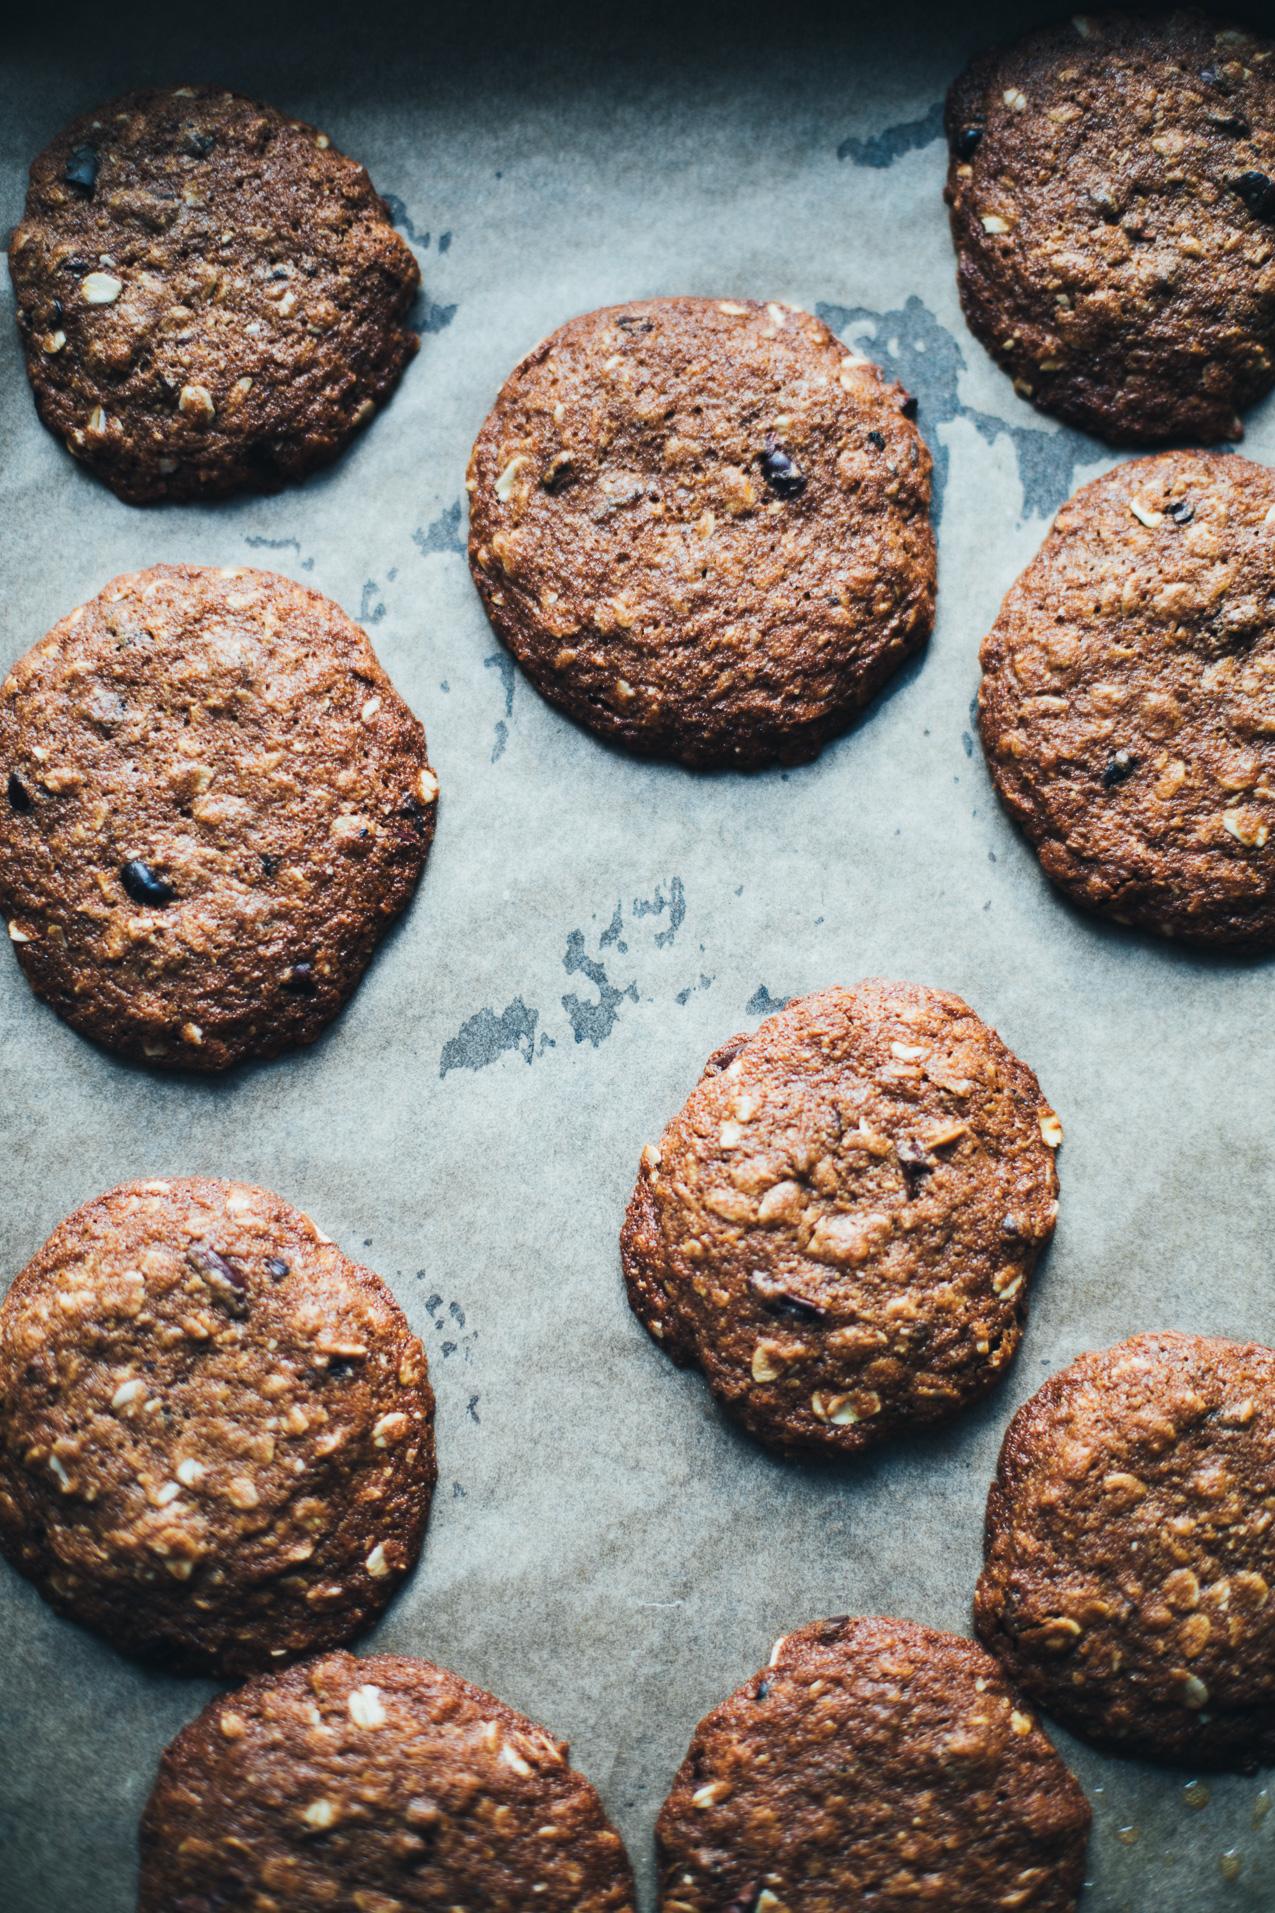 teff-oatmeal-raisin-cookies-9324.jpg